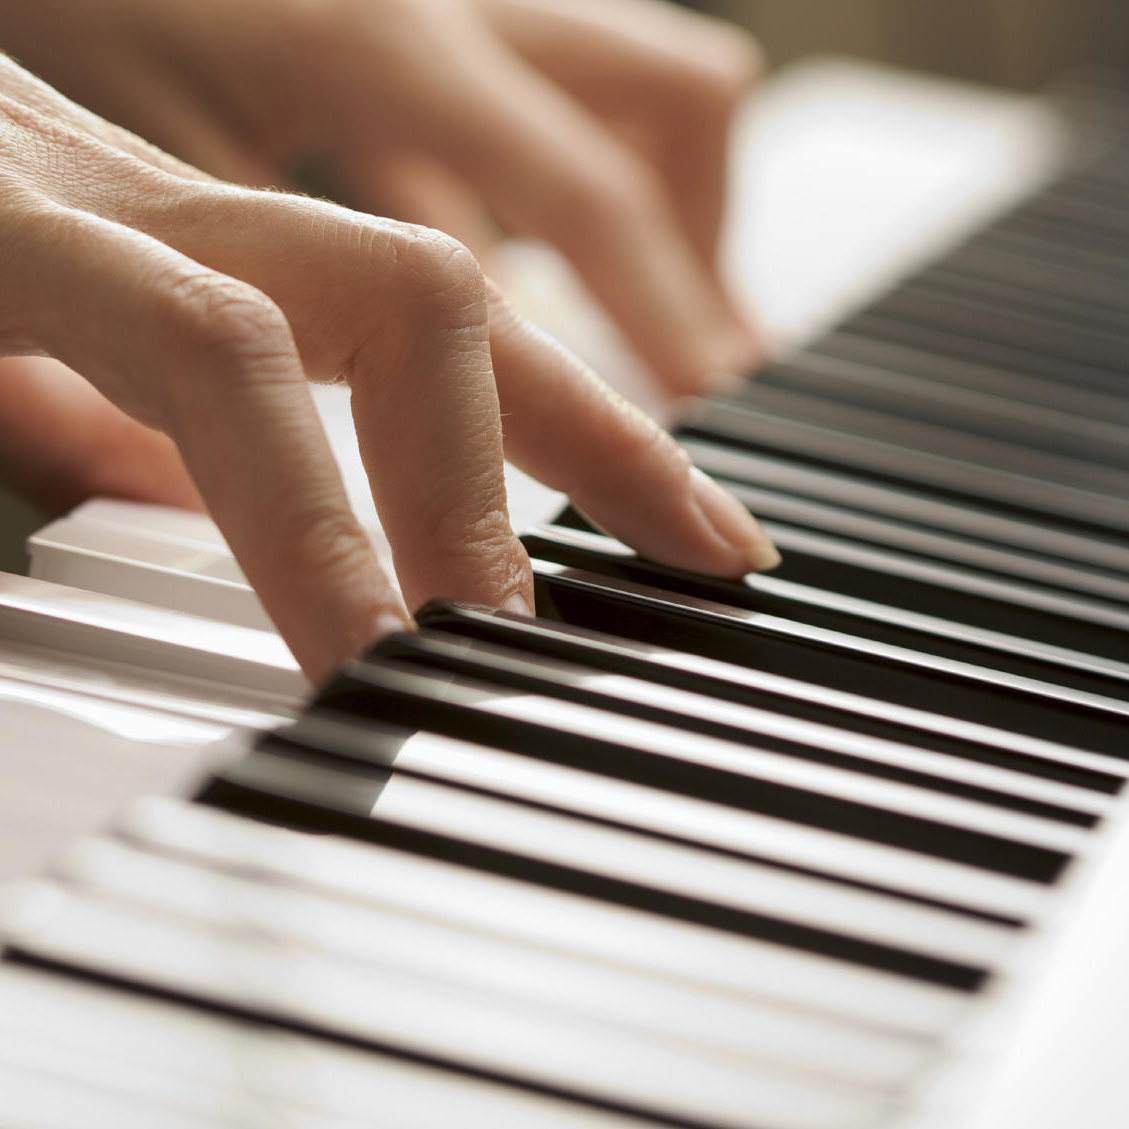 playing-piano3.jpg